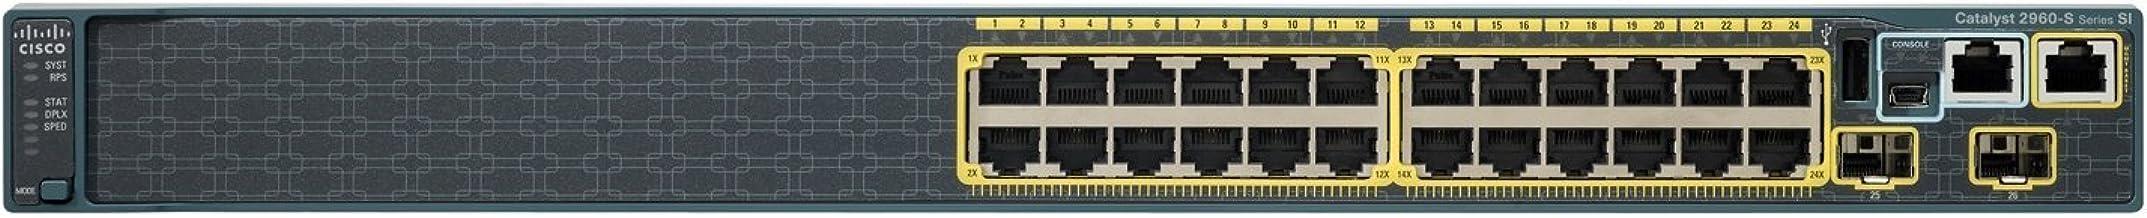 Cisco WS-C2960S-24TS-L WS-C2960S-48TS-L Catalyst 2960S Series 1 Gbps - Conmutador de Red de 24 Puertos (reacondicionado)